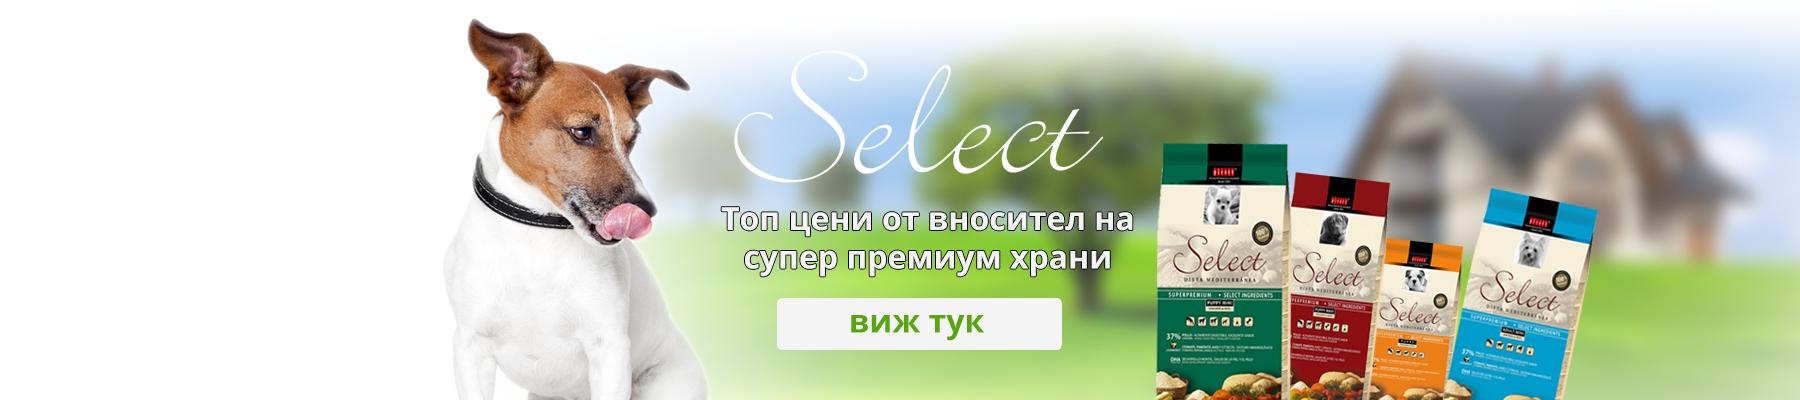 slide-select-food